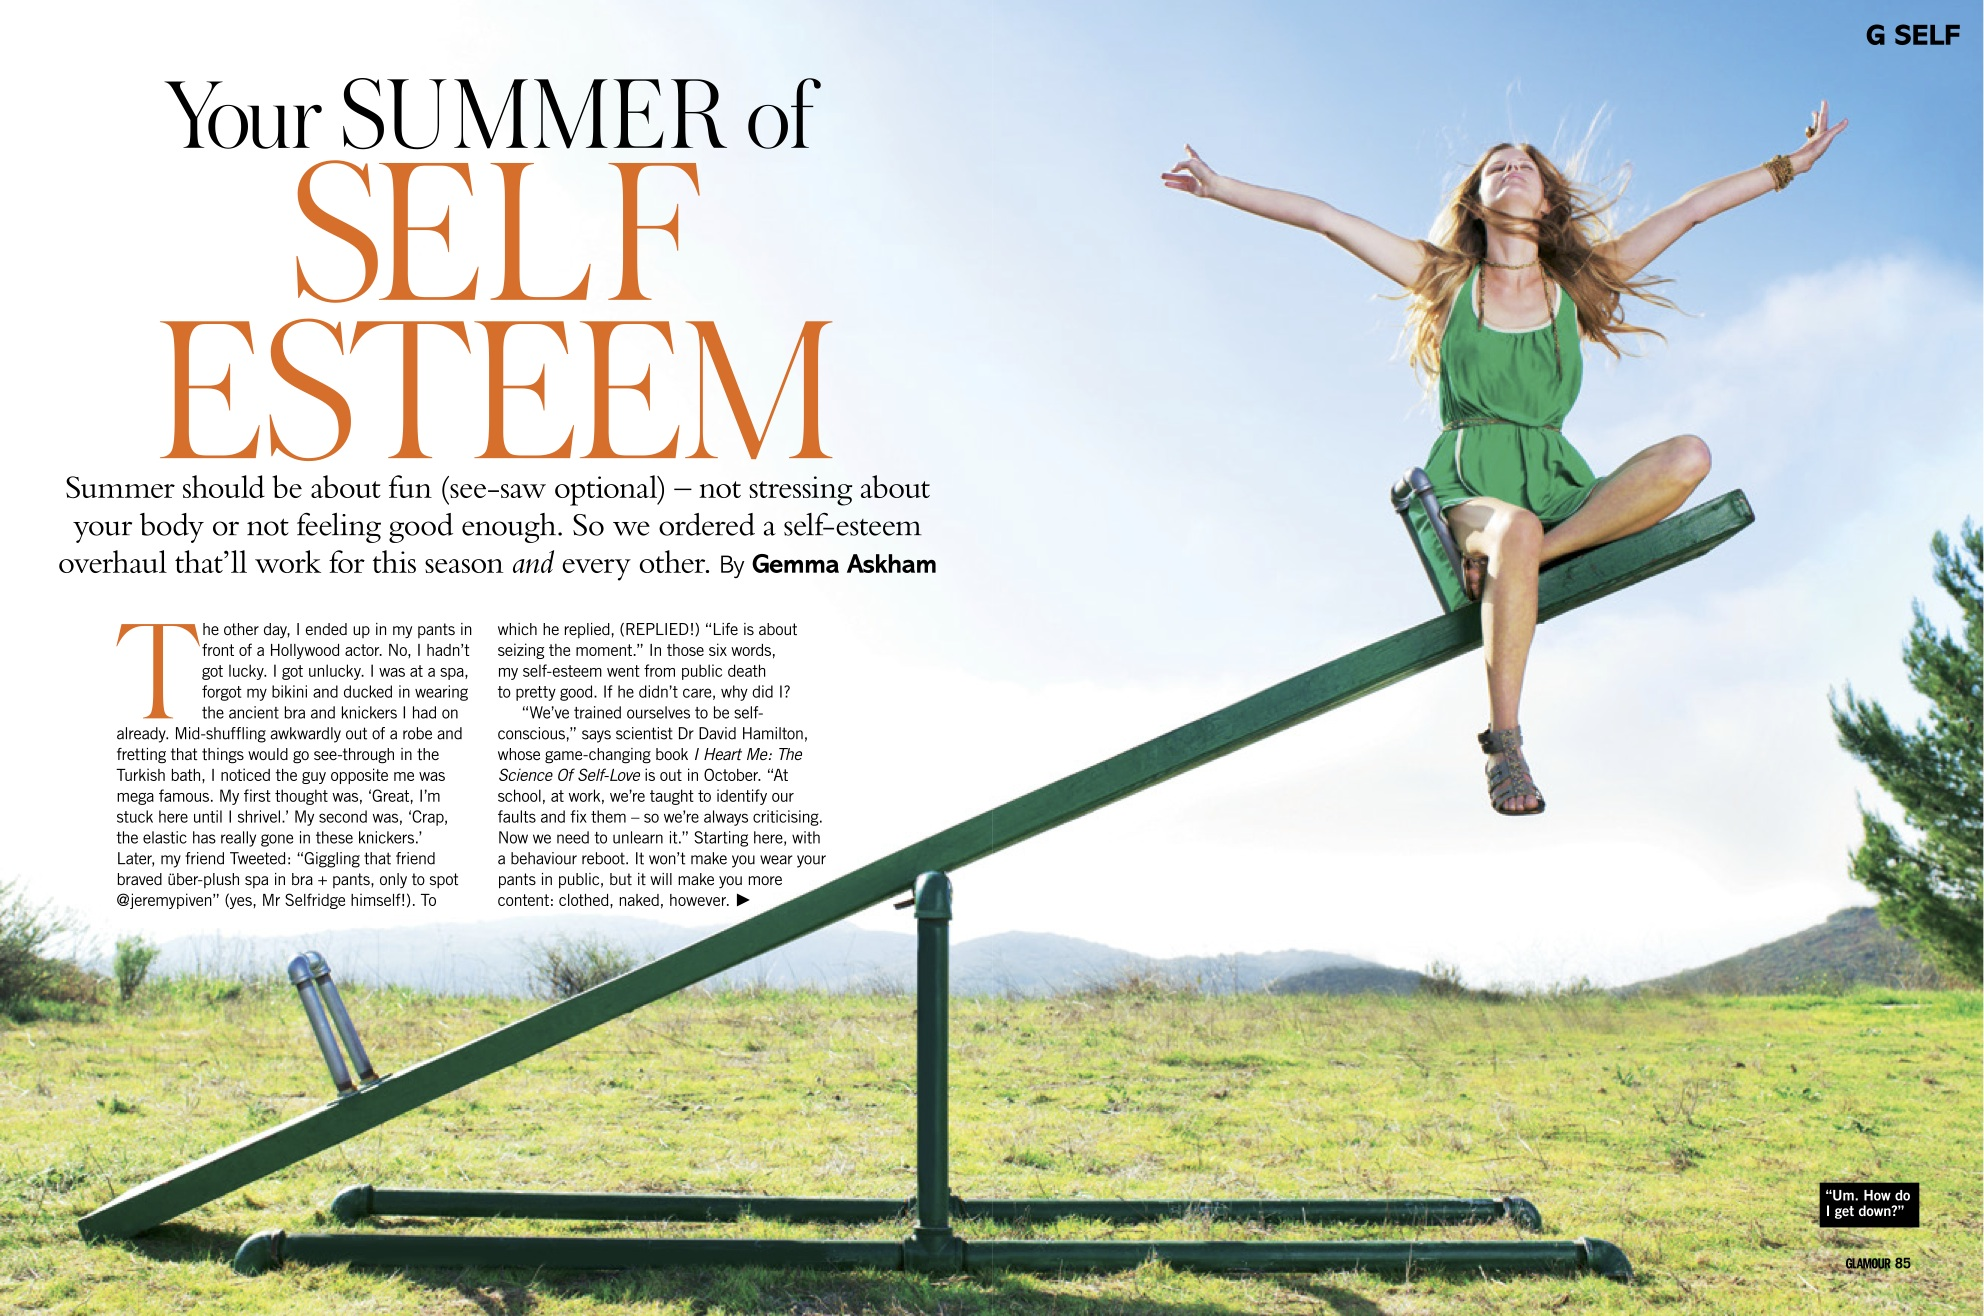 Summer of self-esteem p1.jpg